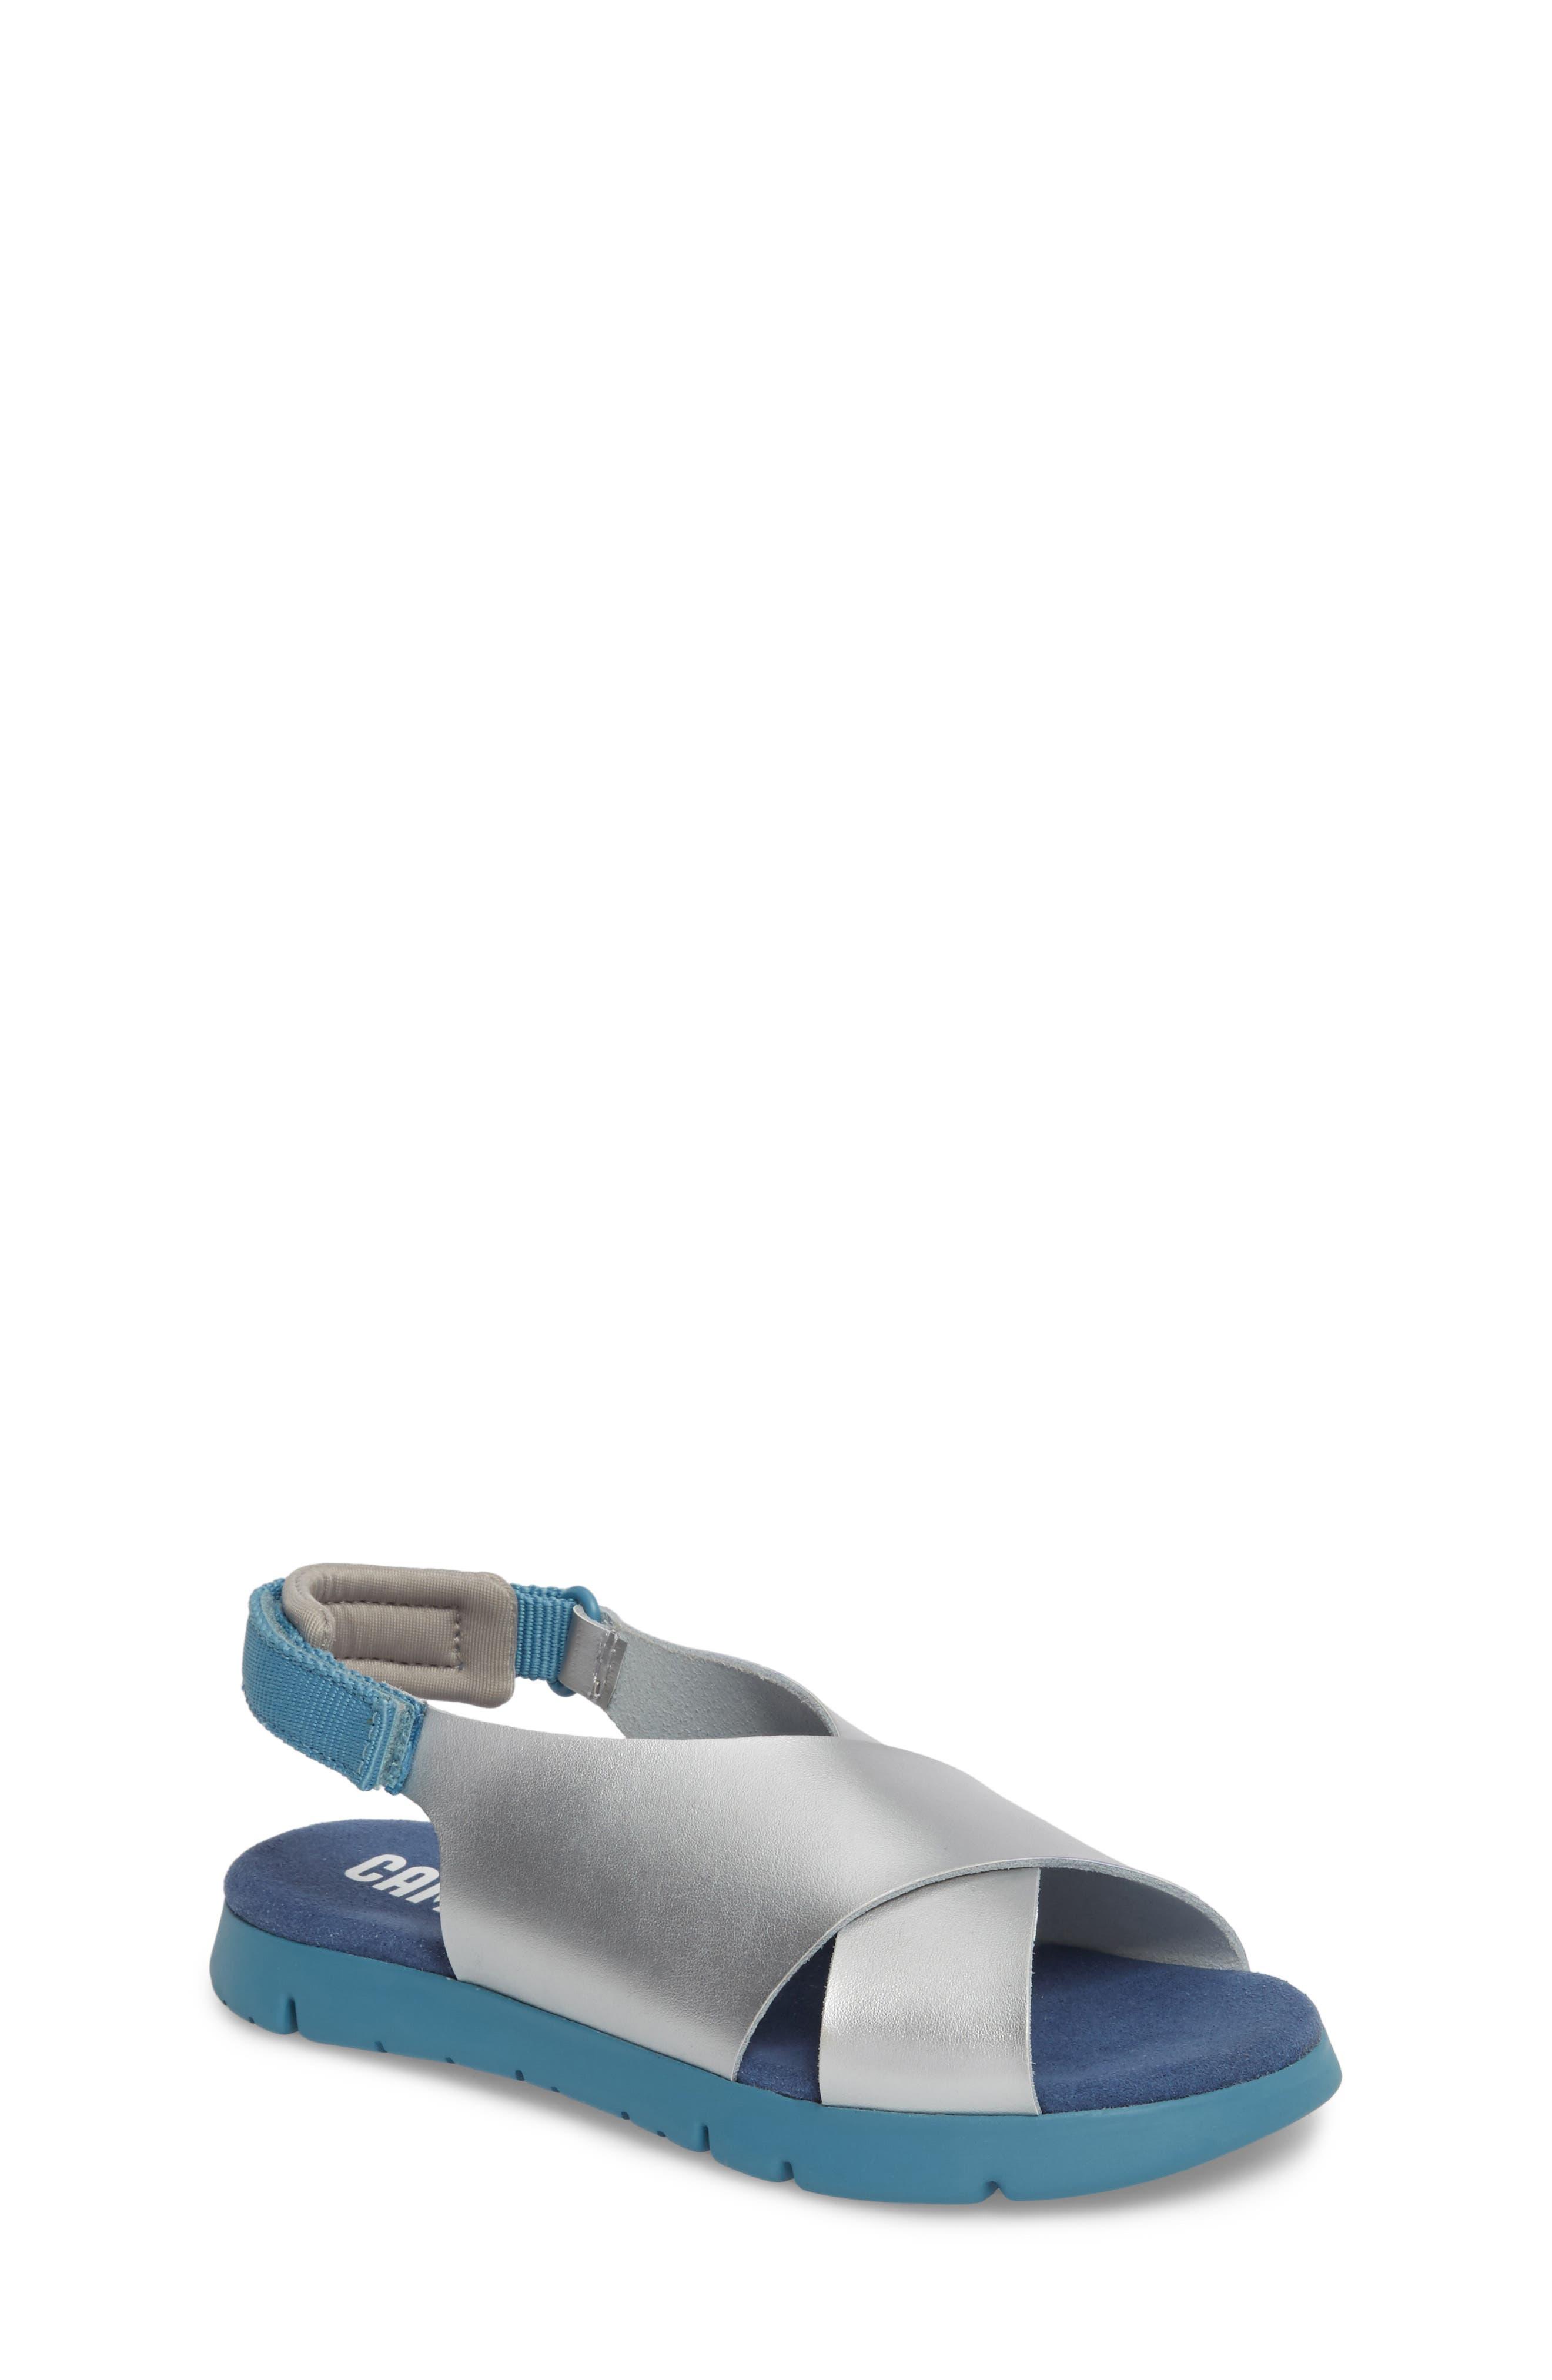 Mira Sandal,                         Main,                         color, Silver